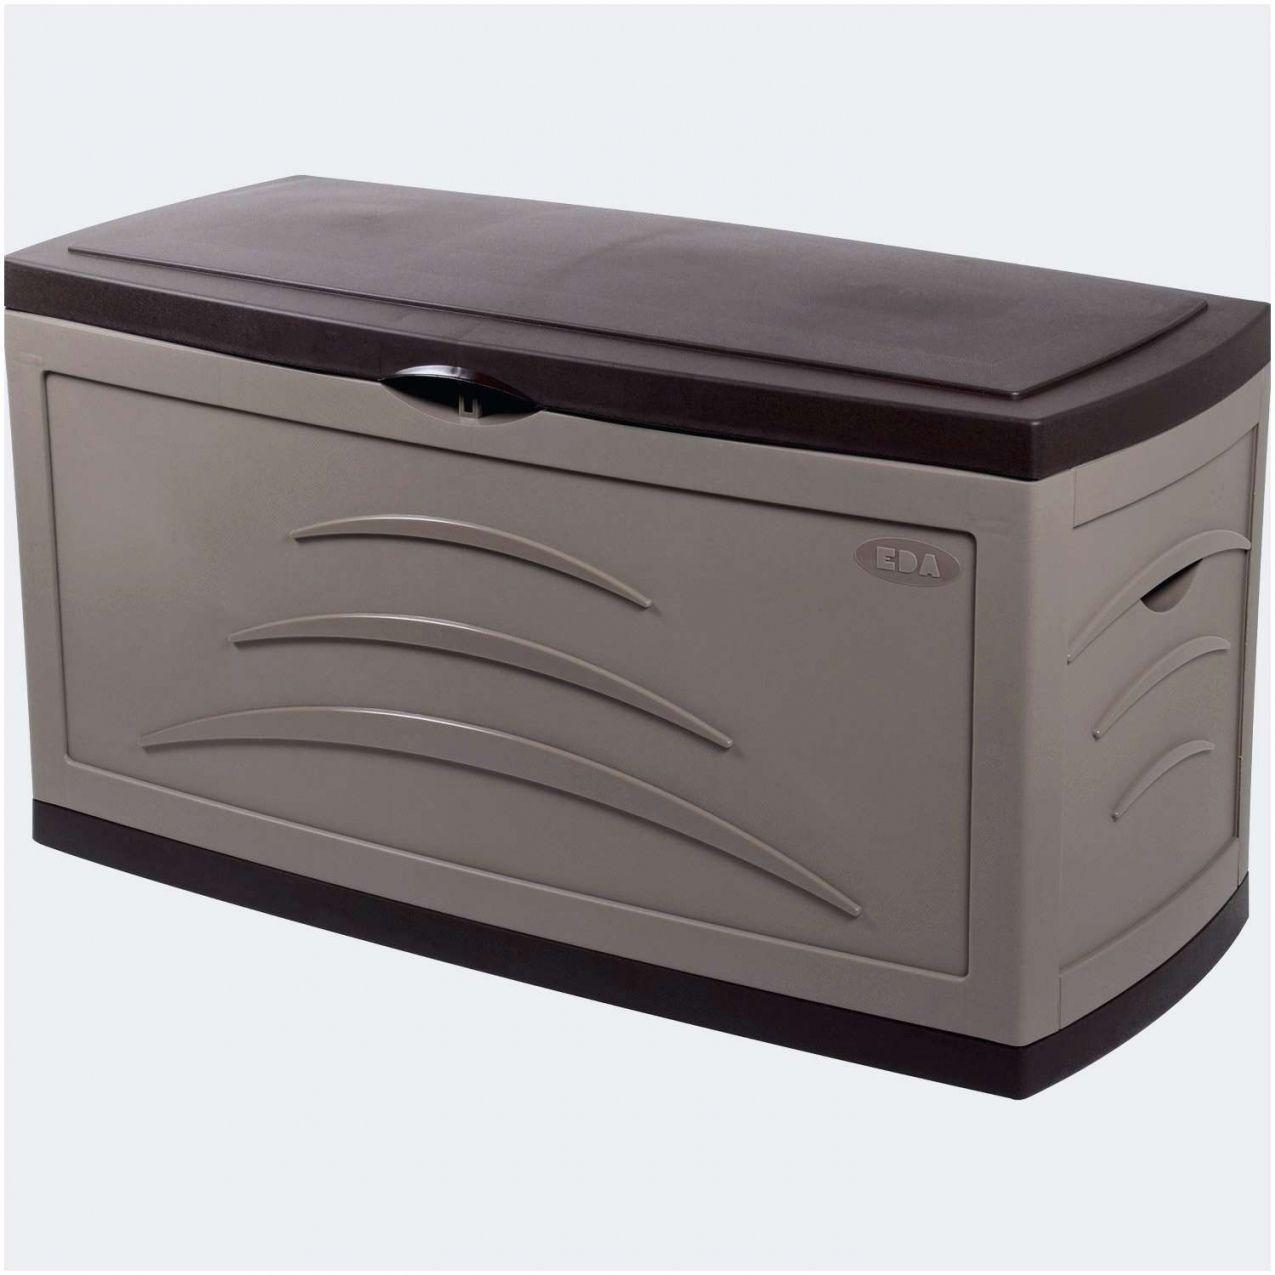 50 Coffre A Linge Ikea 2019 Check more at https://www.unionjacktrooper.com/70-coffre-a-linge ...